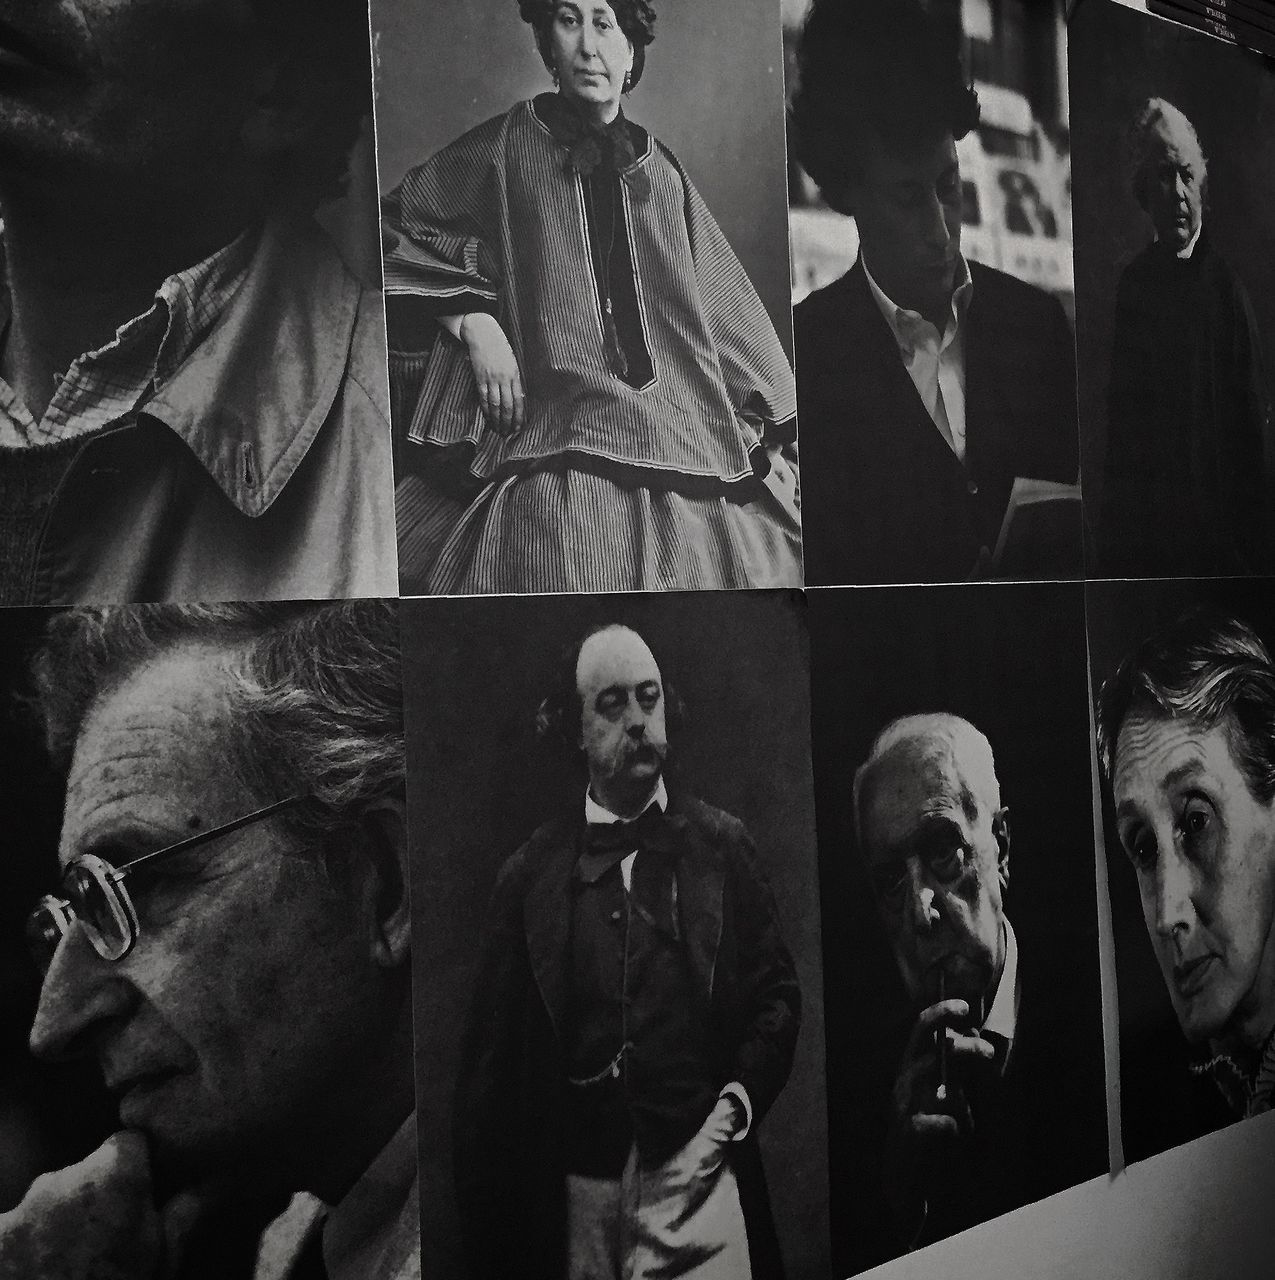 senior adult, real people, men, statue, indoors, multiple image, portrait, day, people